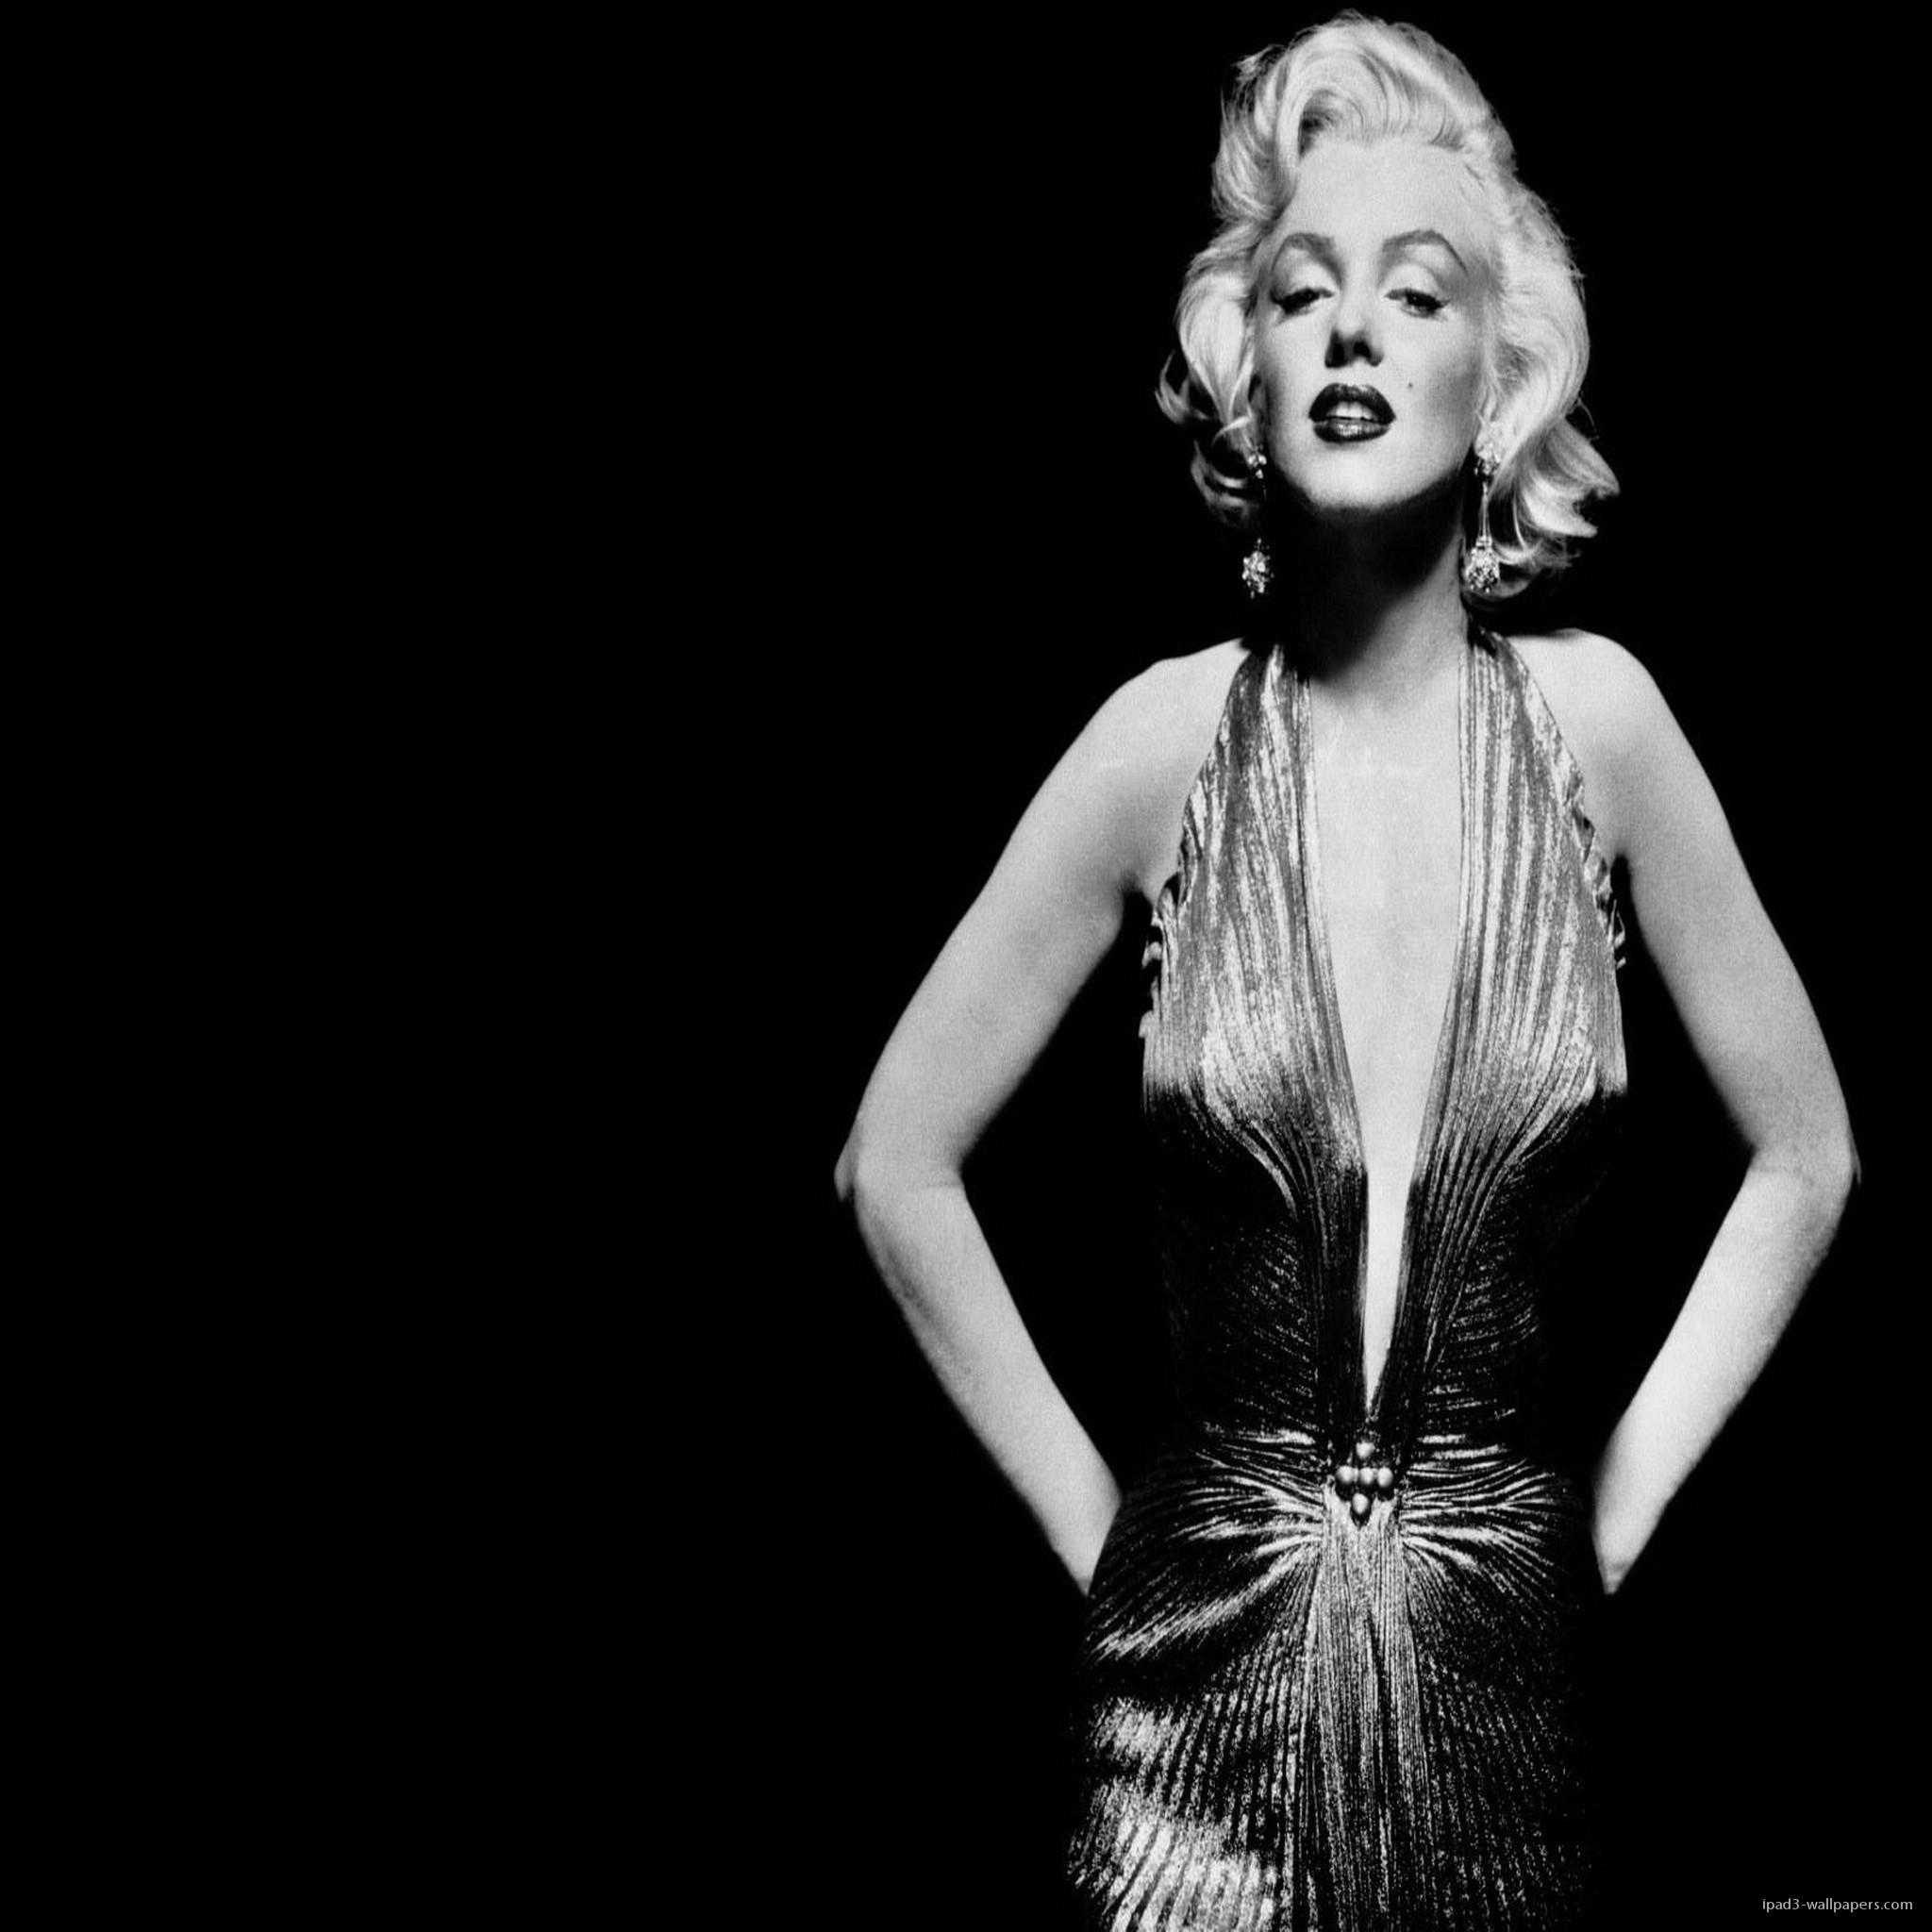 HD Marilyn Monroe Wallpapers - WallpaperSafari